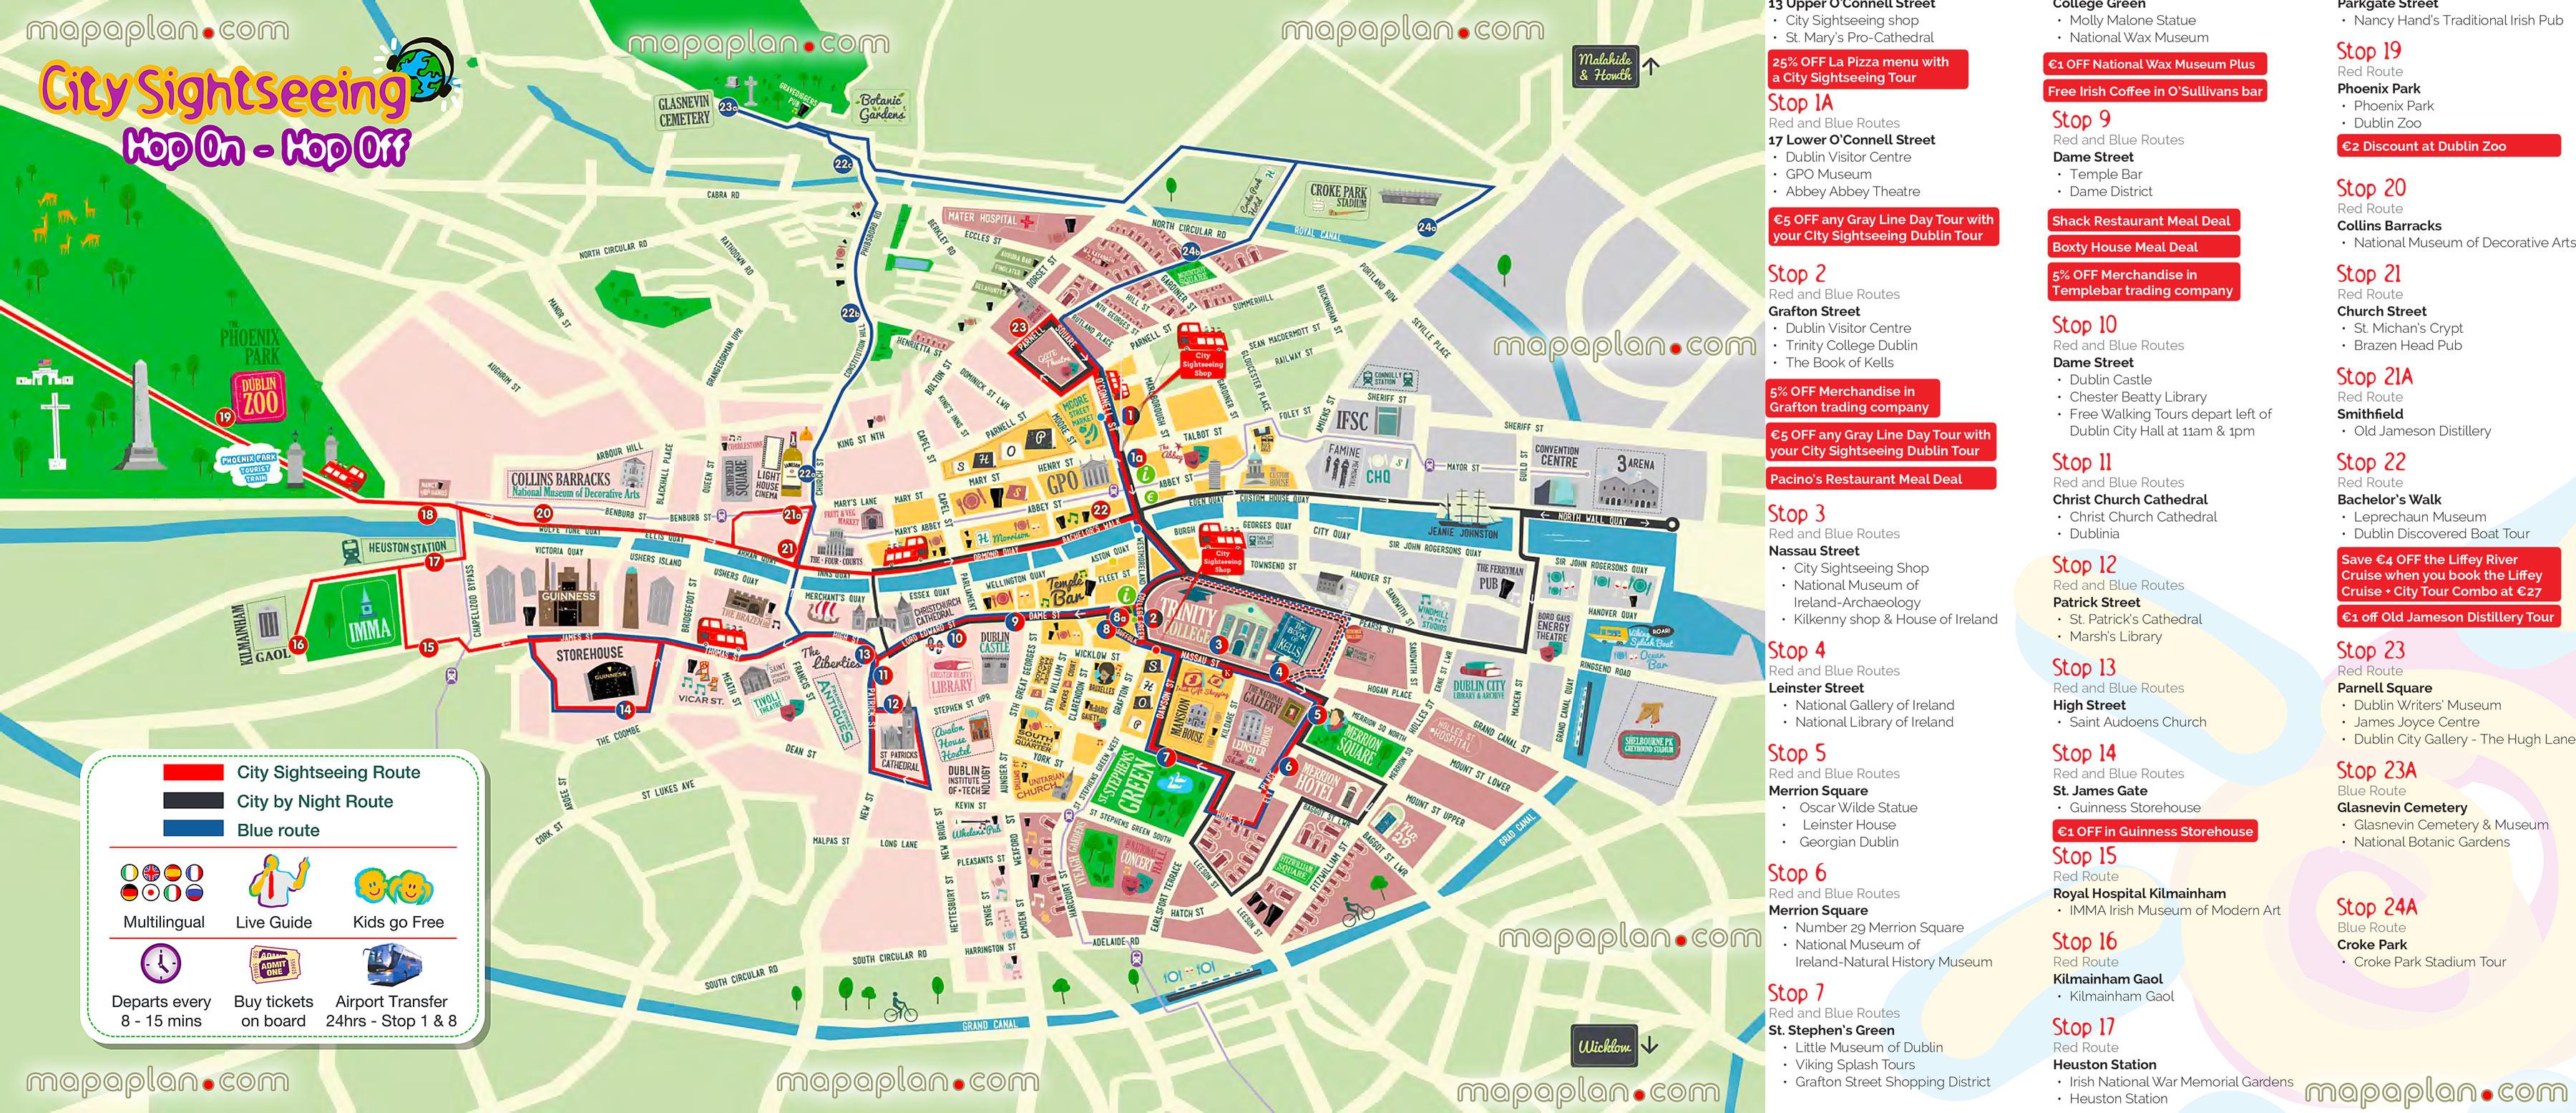 Dublin Map - Hop-On Hop-Off Bus Map Of Dublin City Sightseeing Tour - Dublin Tourist Map Printable